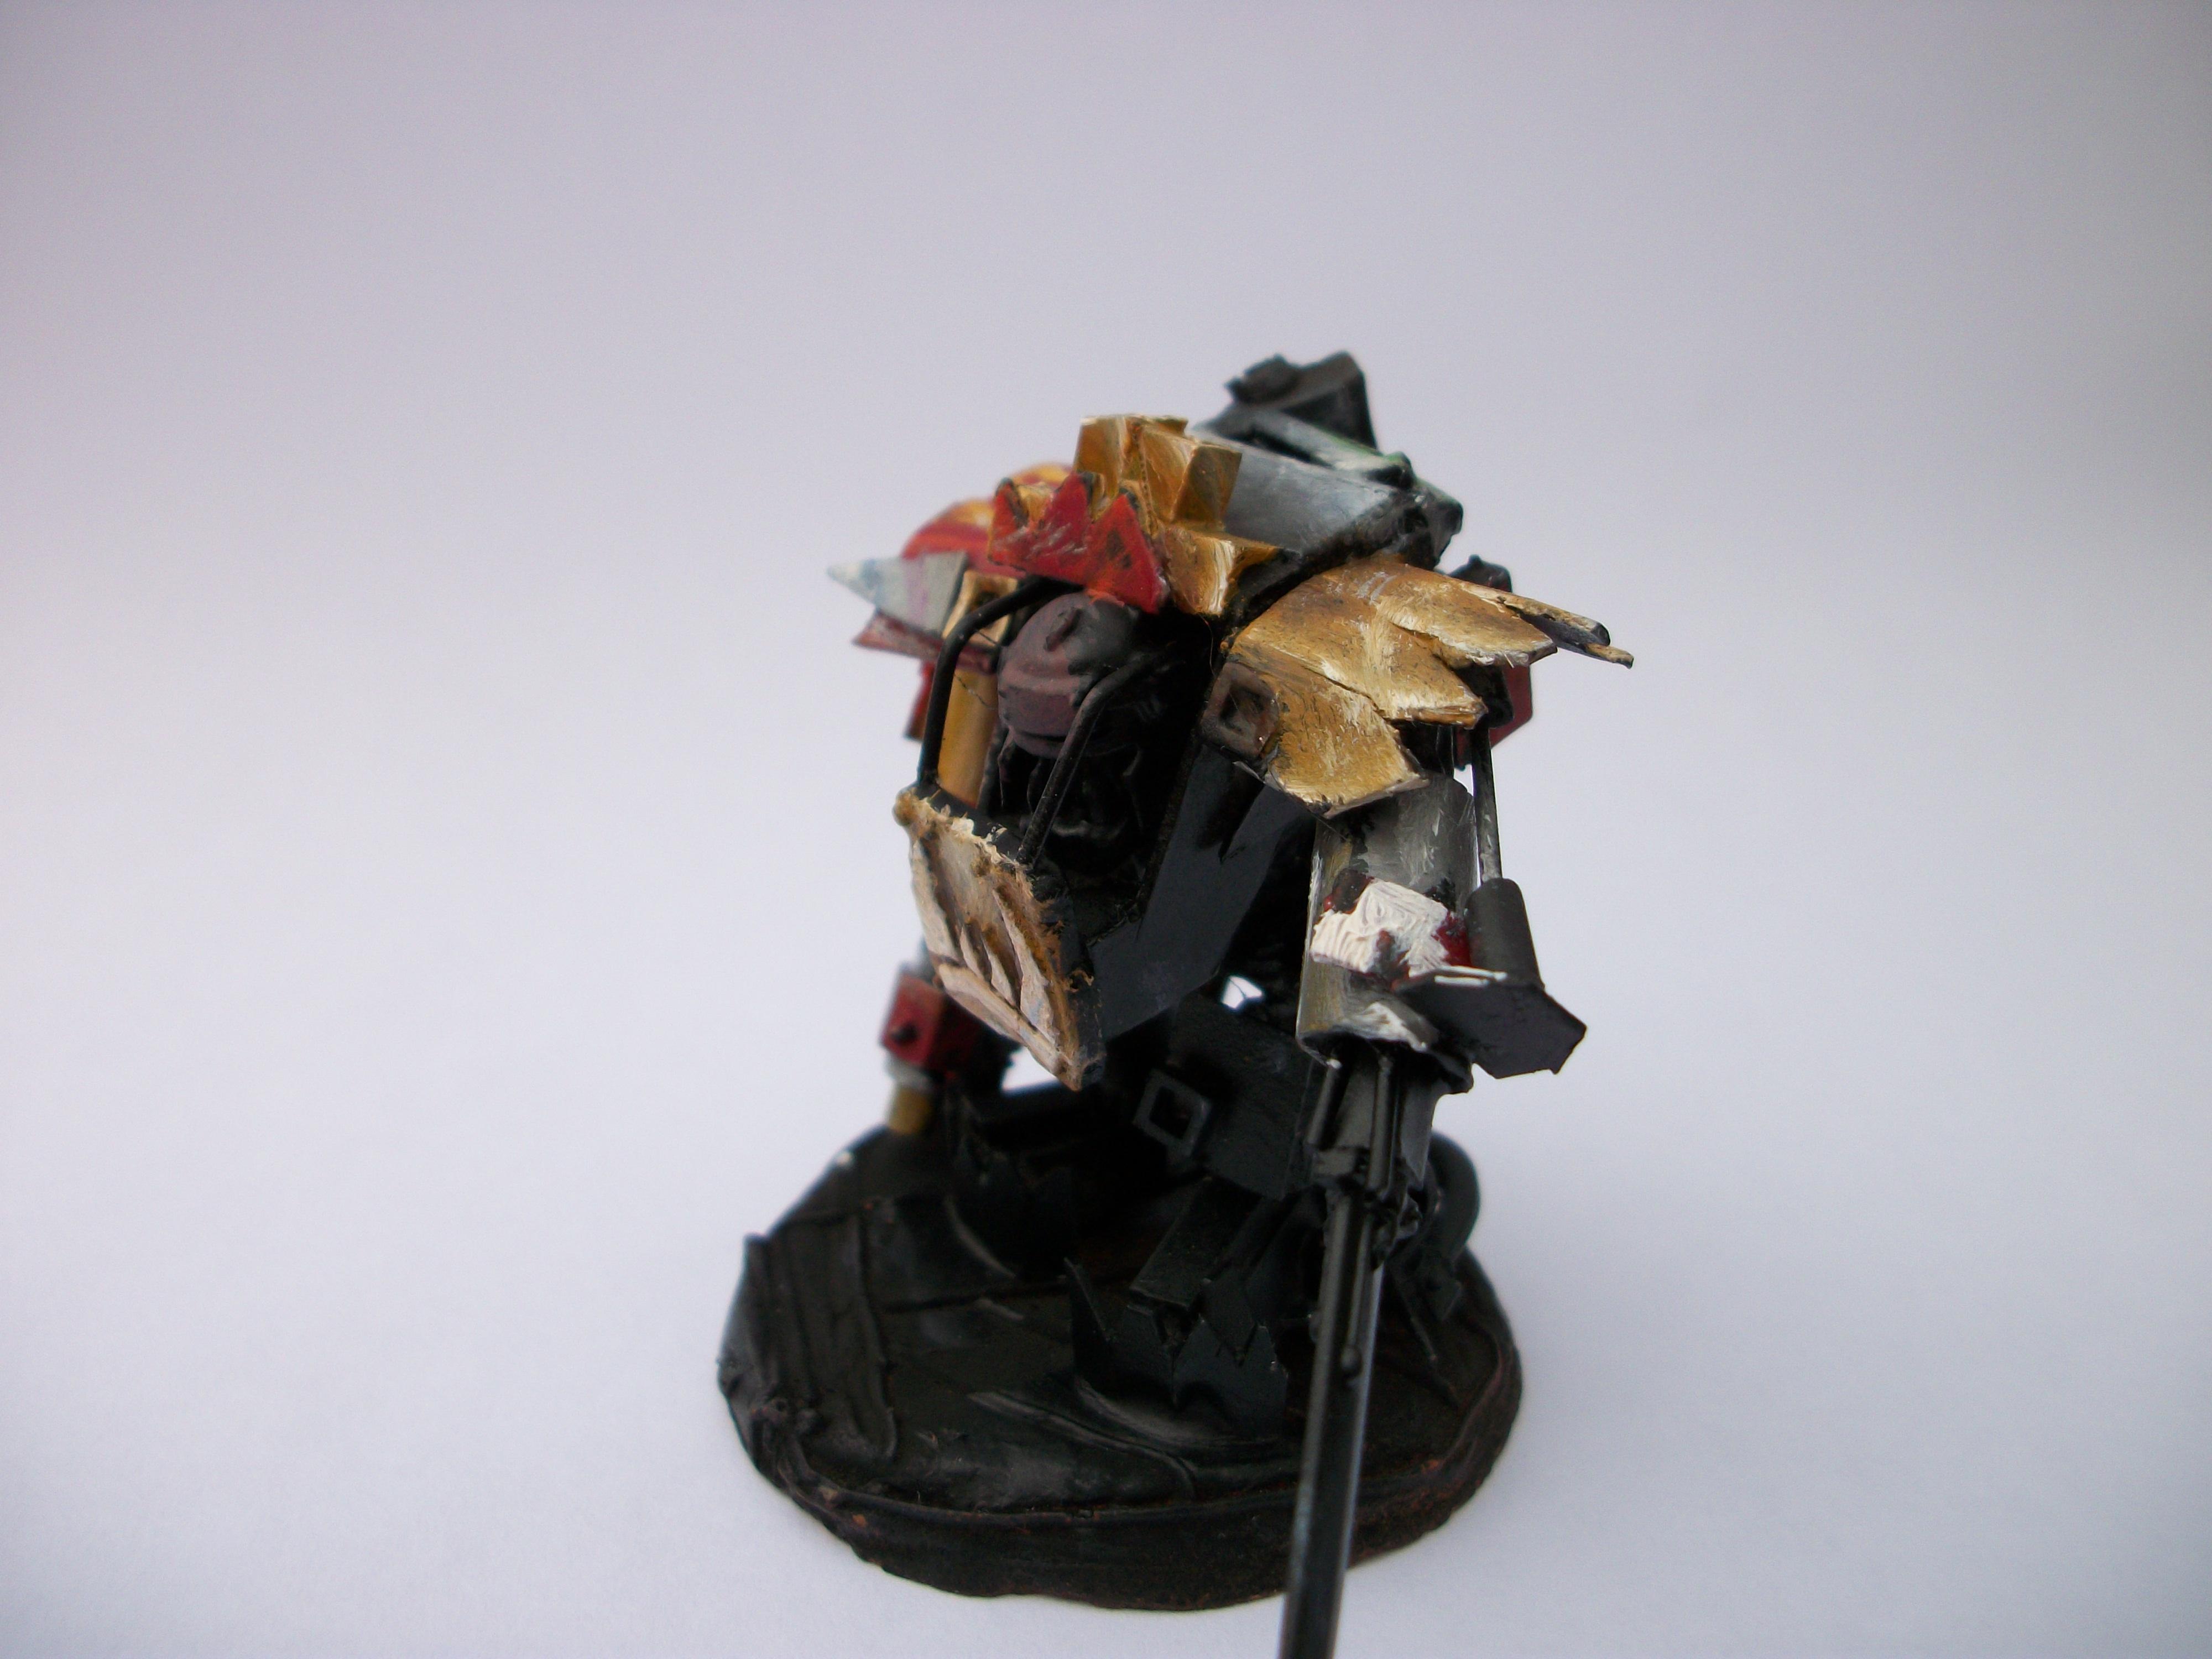 Meganob, Orks, meganob